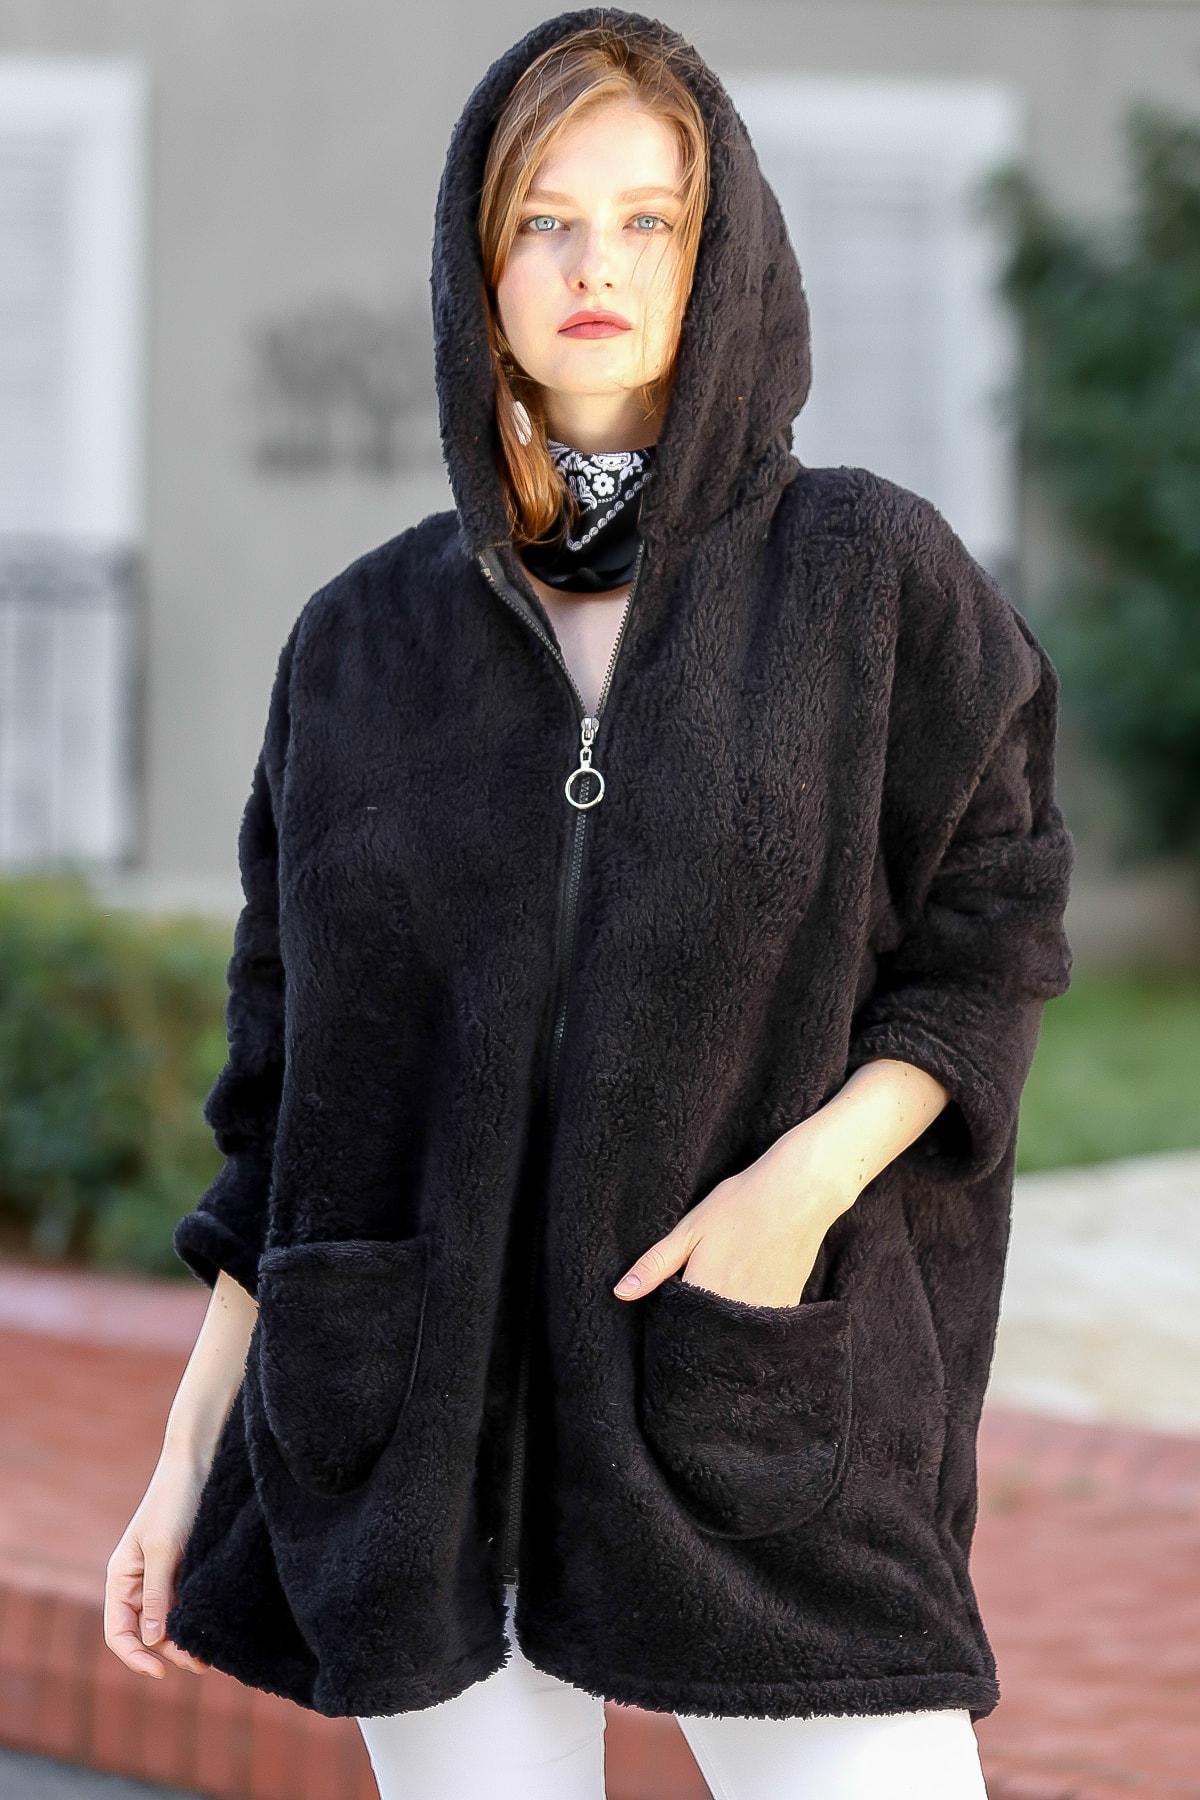 Chiccy Kadın Siyah Casual Kapüşonlu Cep Detaylı Polar Ceket M10210100CE99260